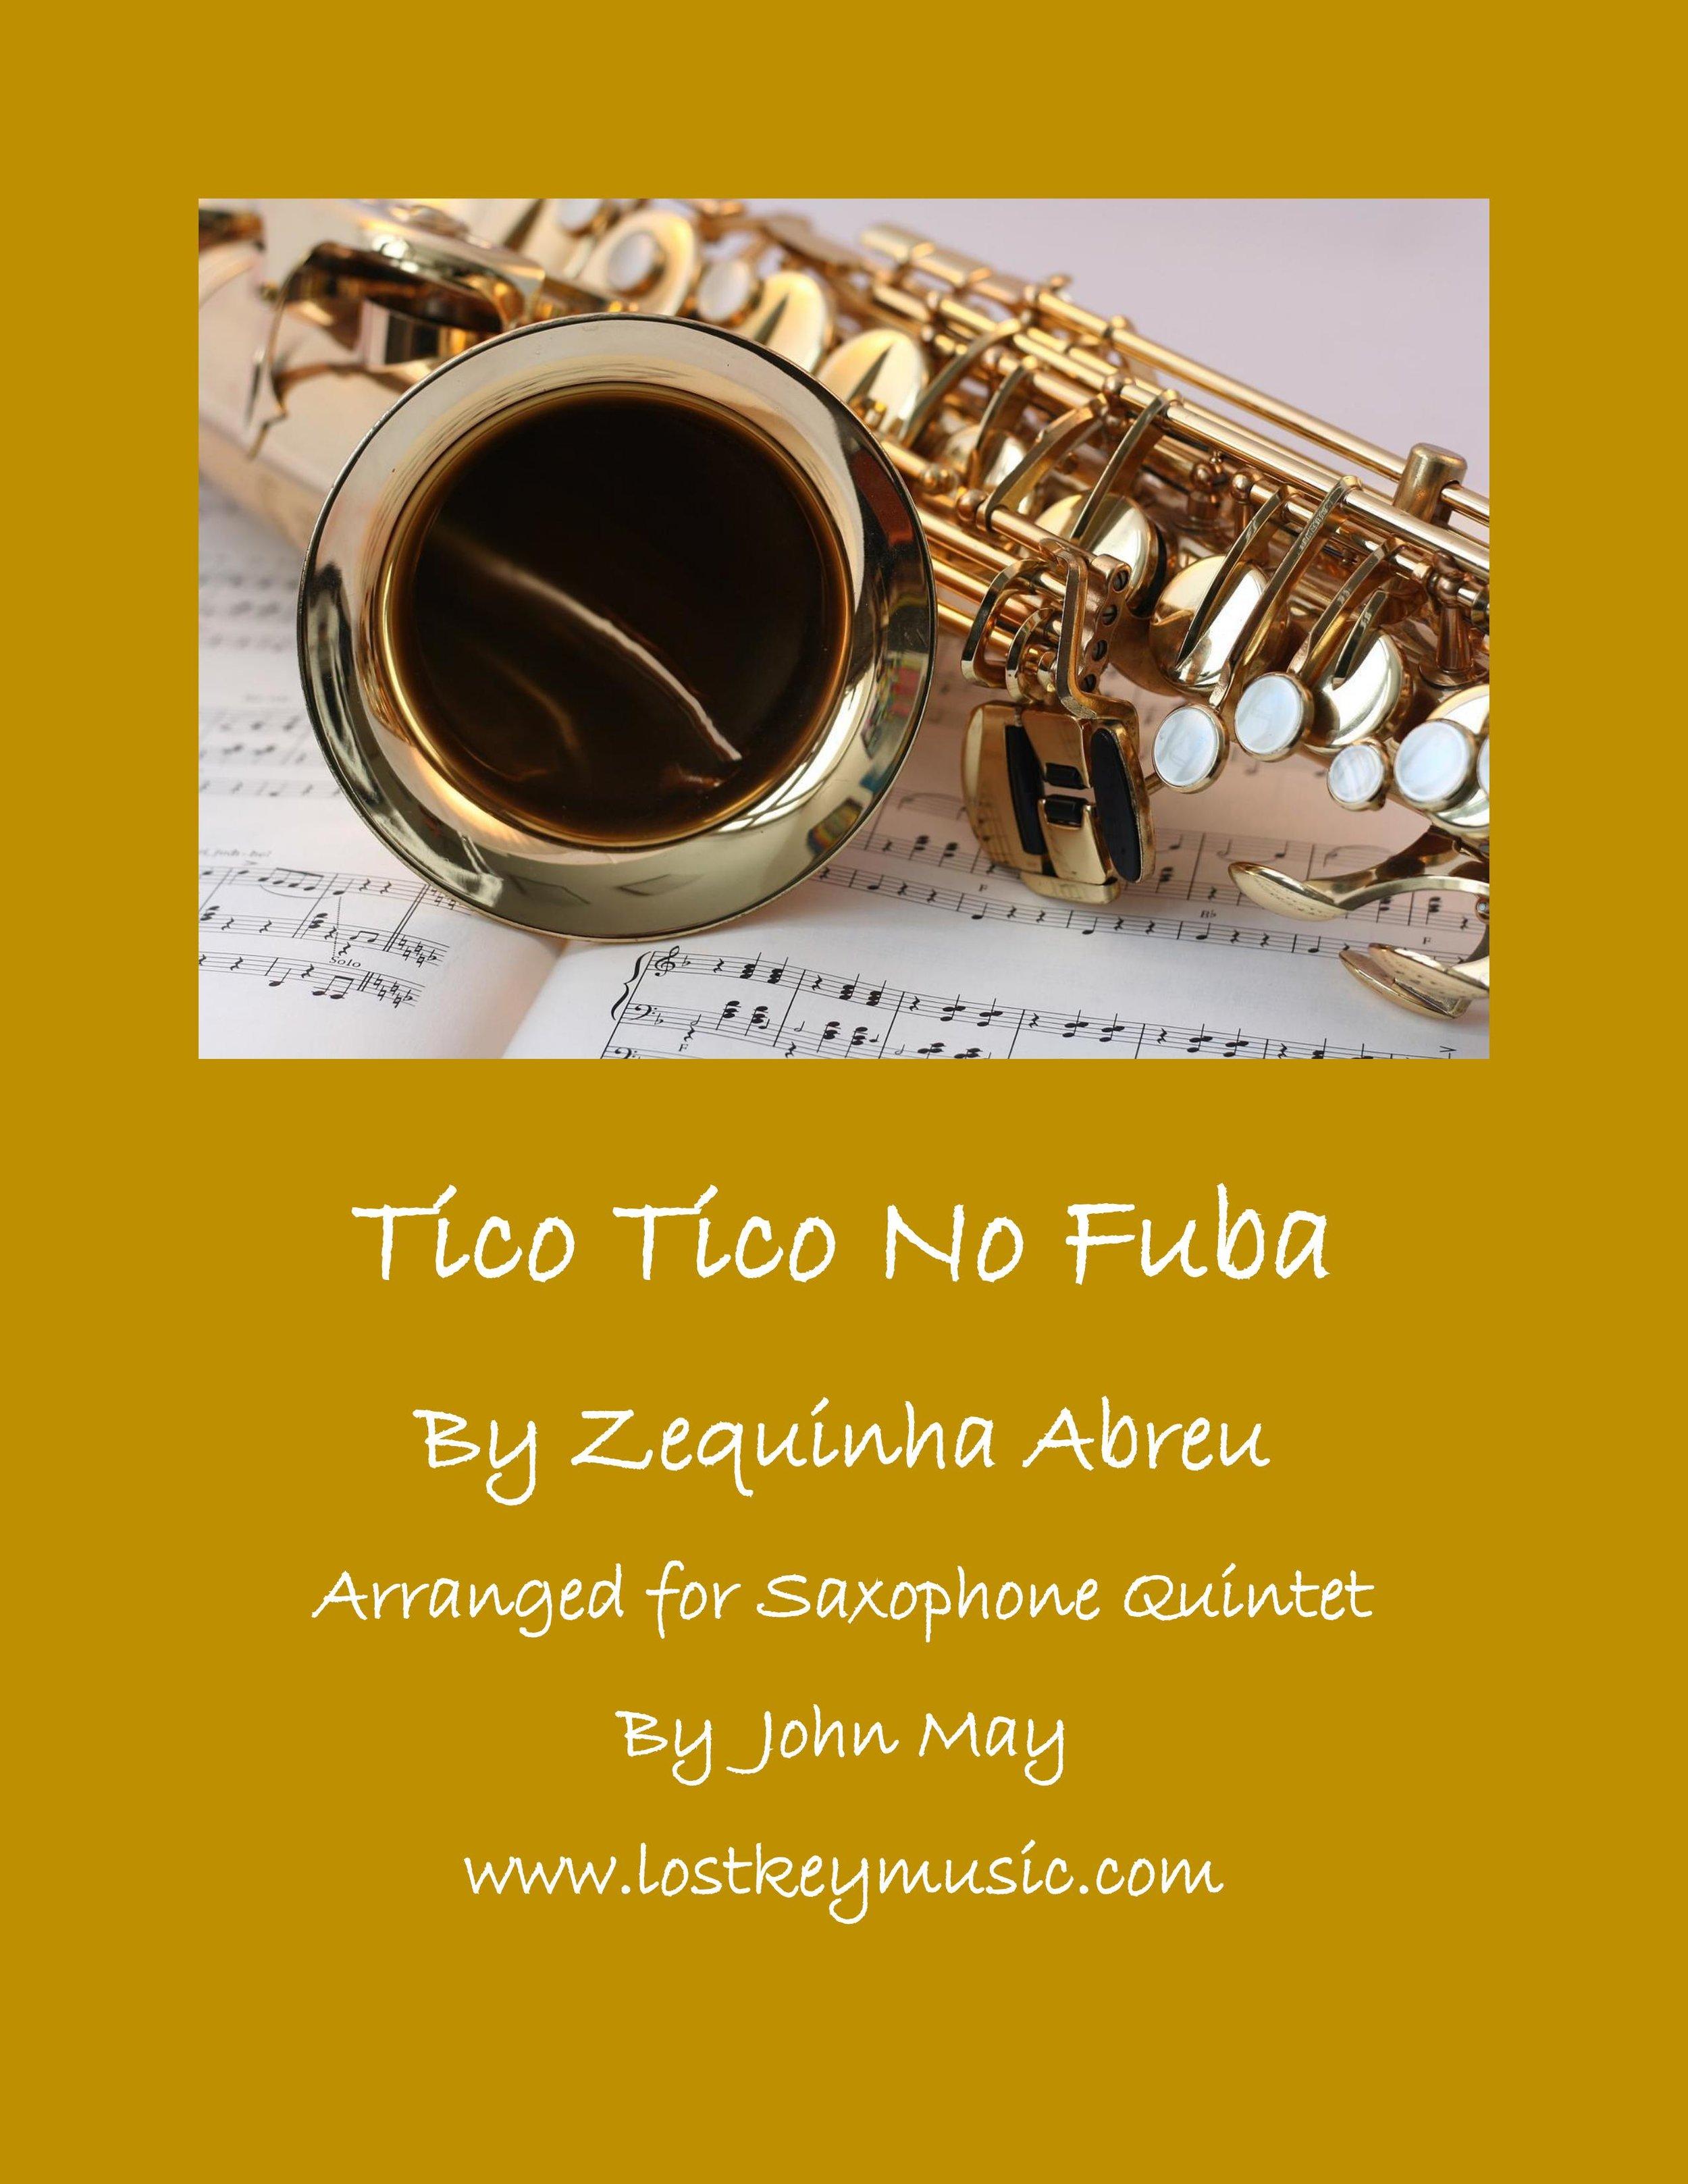 Tico Tico No Fuba-Saxophone Quintet-Cover Photo.jpg